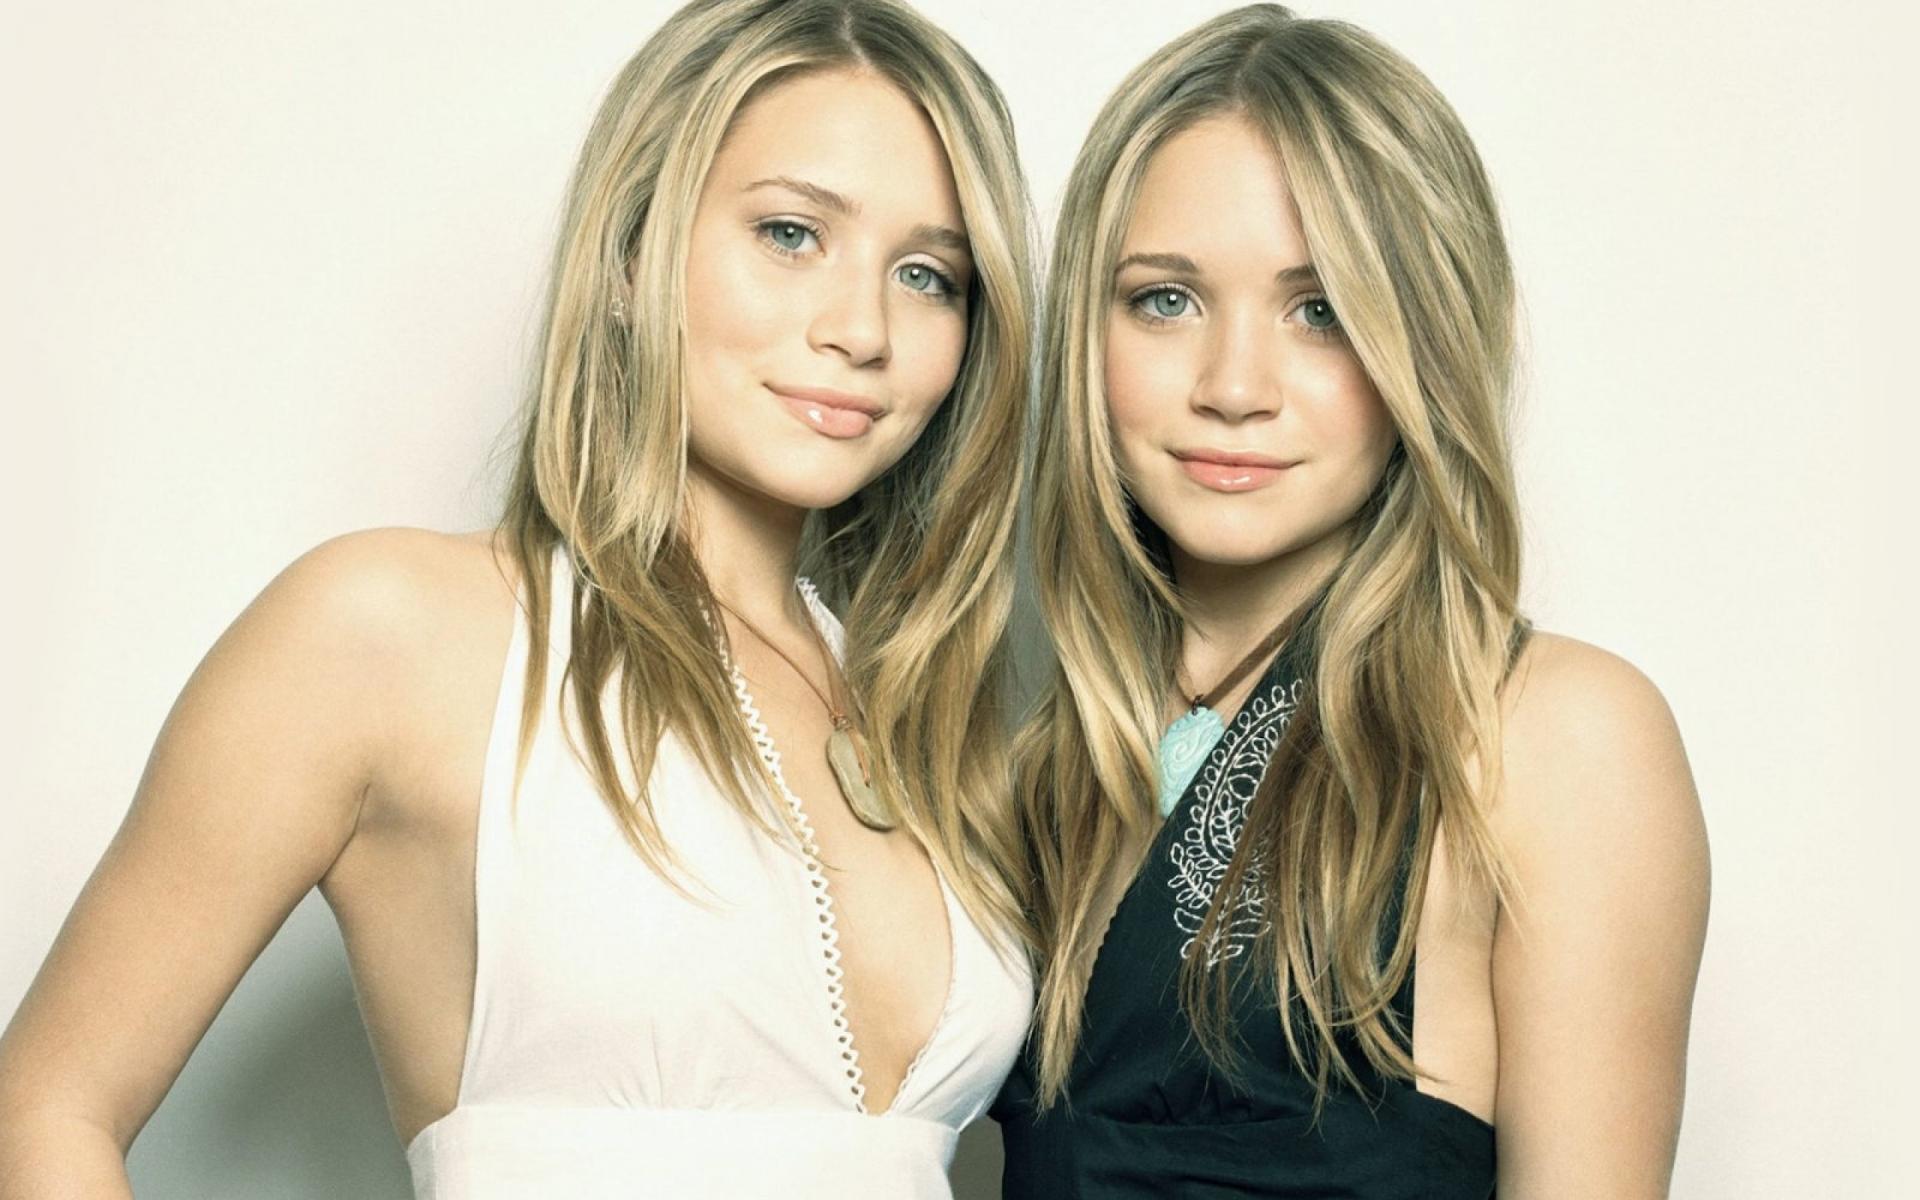 best of Twins adult Olsen